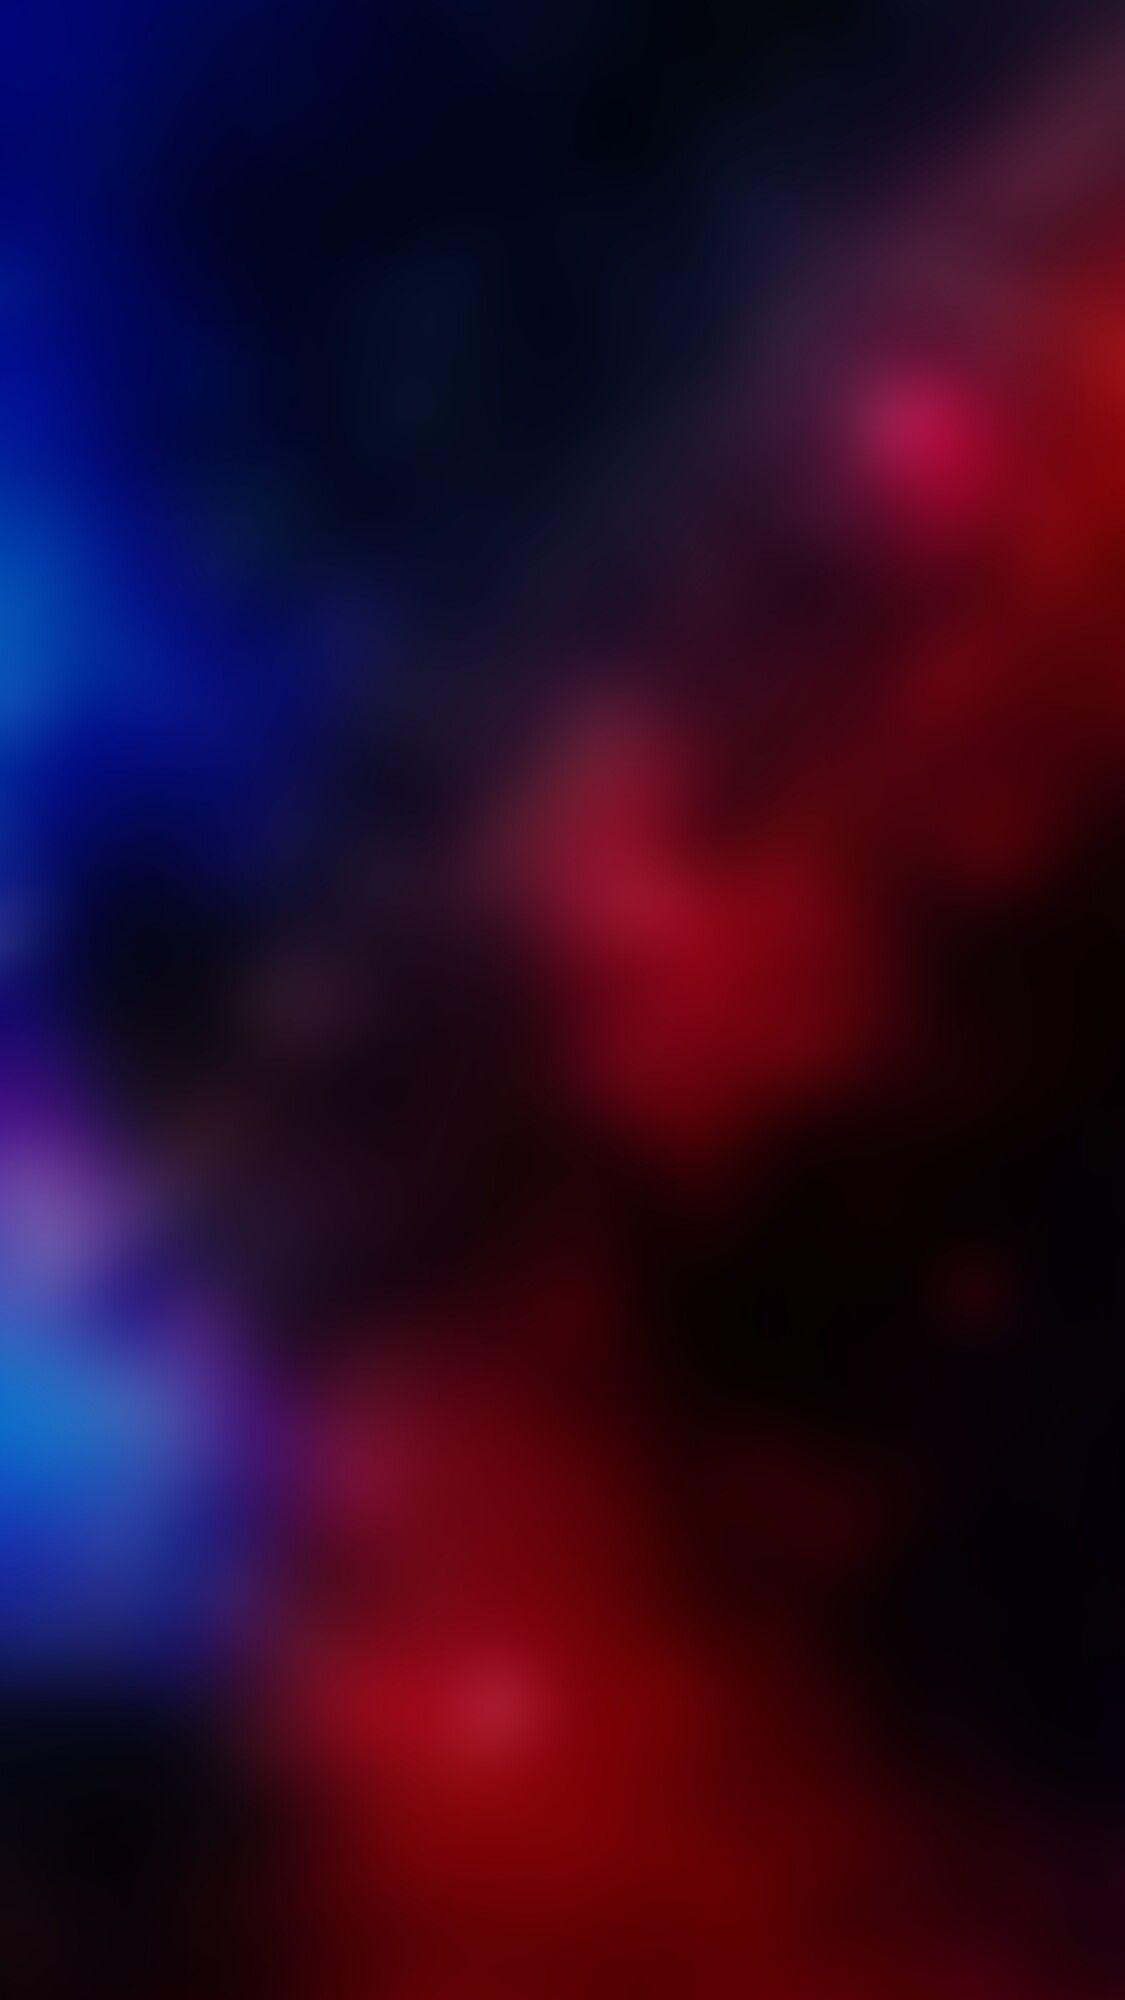 Pin By Iyan Sofyan On Abstract Amoled Liquid Gradient Samsung Wallpaper Xiaomi Wallpapers Colorful Wallpaper